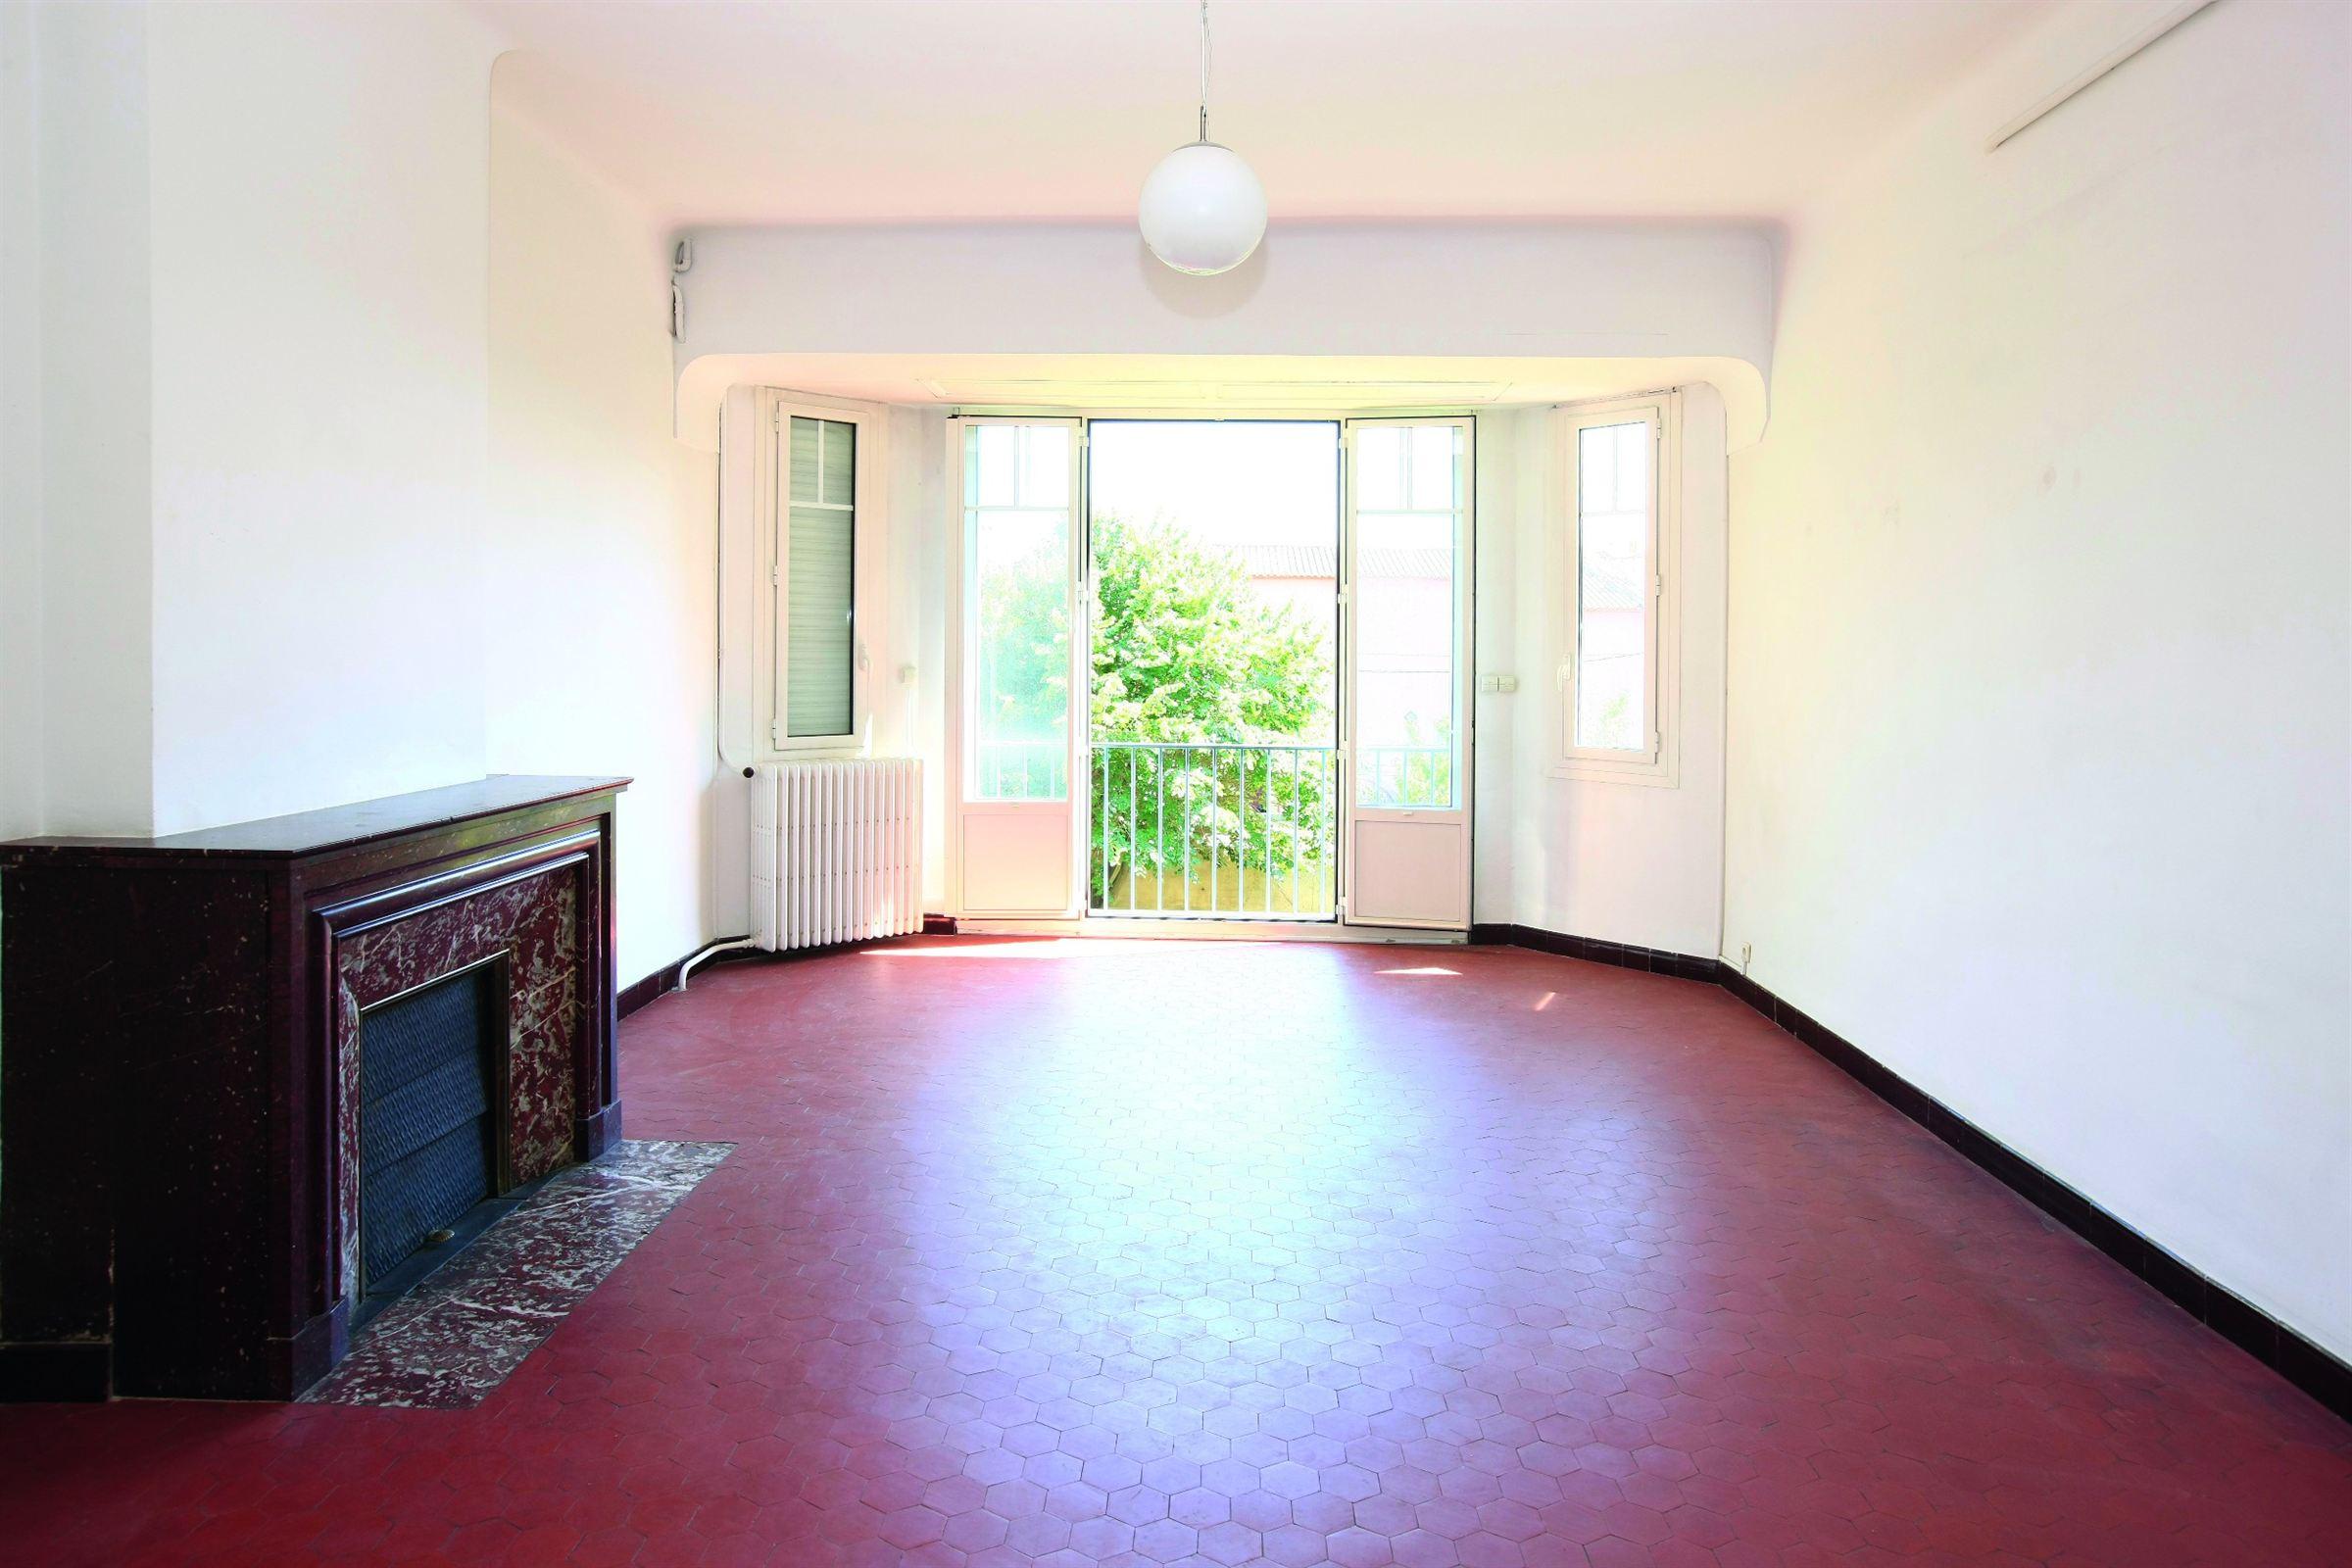 Apartamento para Venda às 2minutes by foot from Cours Mirabeau - Aix-en-Provence Other Provence-Alpes-Cote D'Azur, Provença-Alpes-Costa Azul, 13100 França